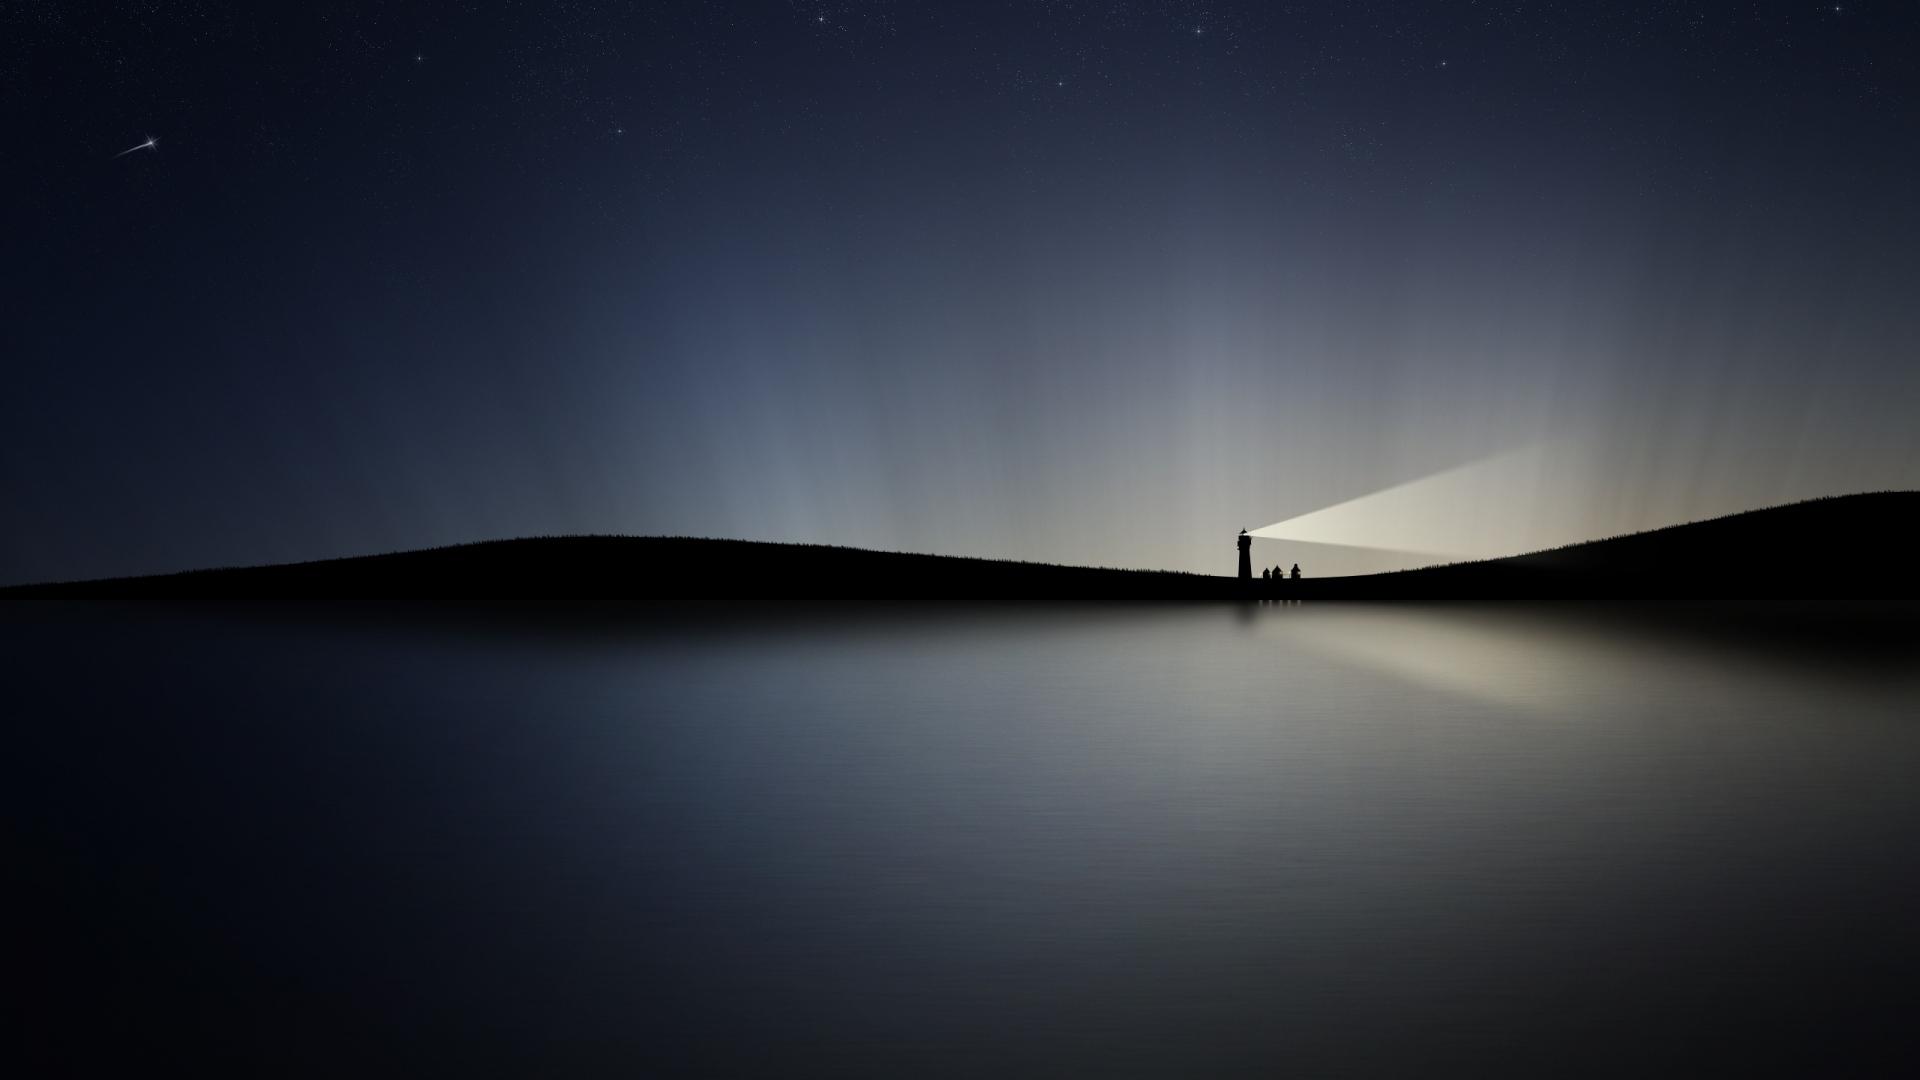 Must see Wallpaper Night Lighthouse - night_water_lighthouse_shining_74439_1920x1080  Snapshot-97428.jpg